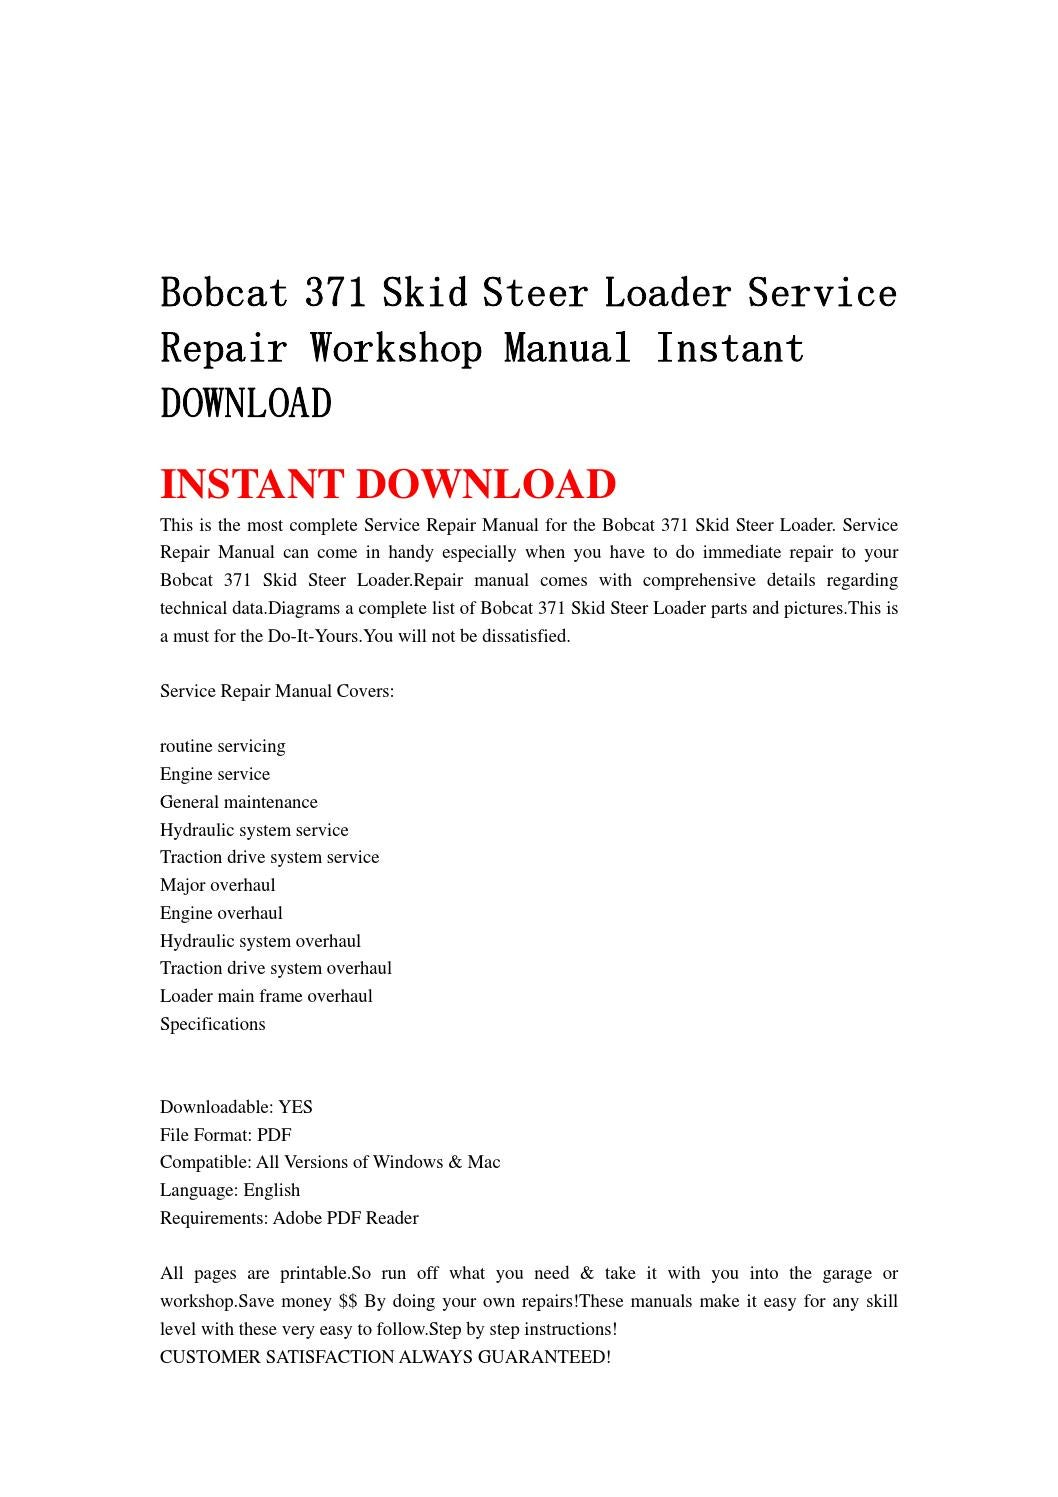 Bobcat 371 Skid Steer Loader Service Repair Workshop